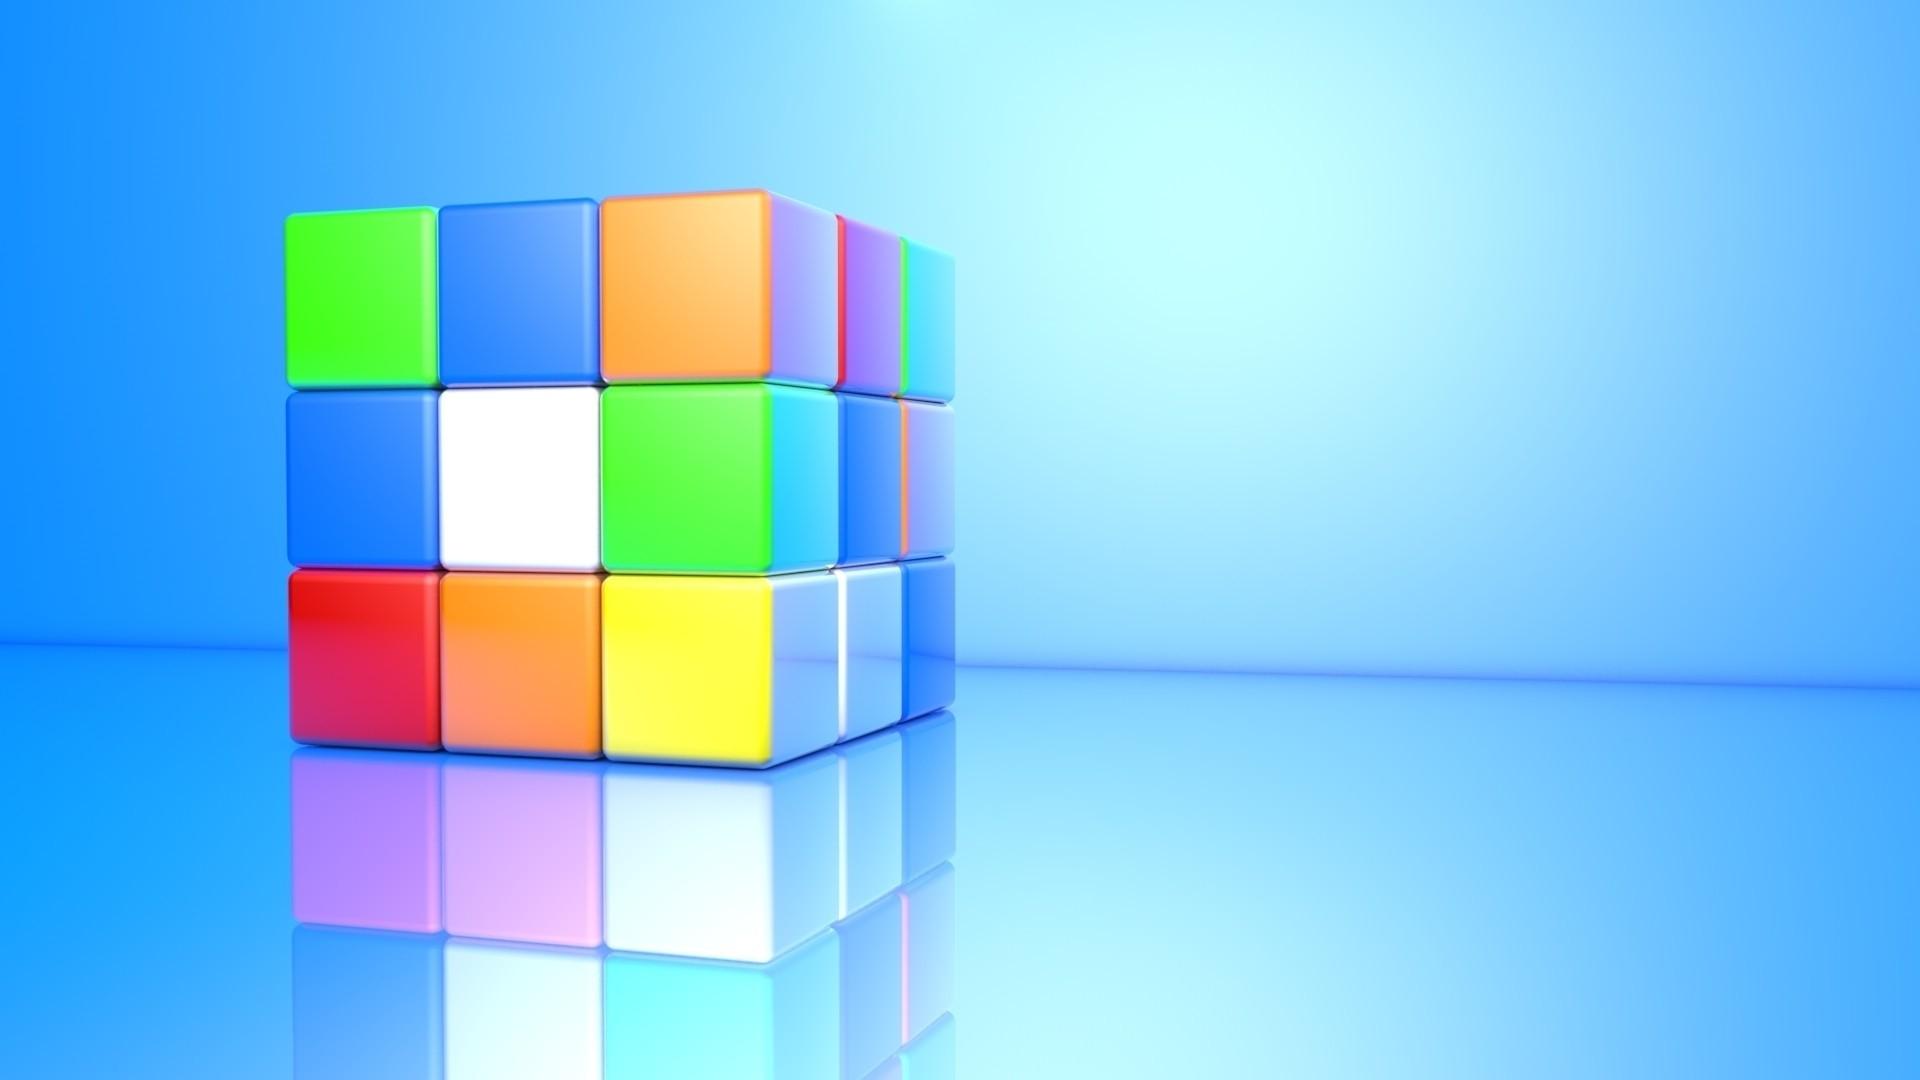 Colorful Wallpaper HD 1080p